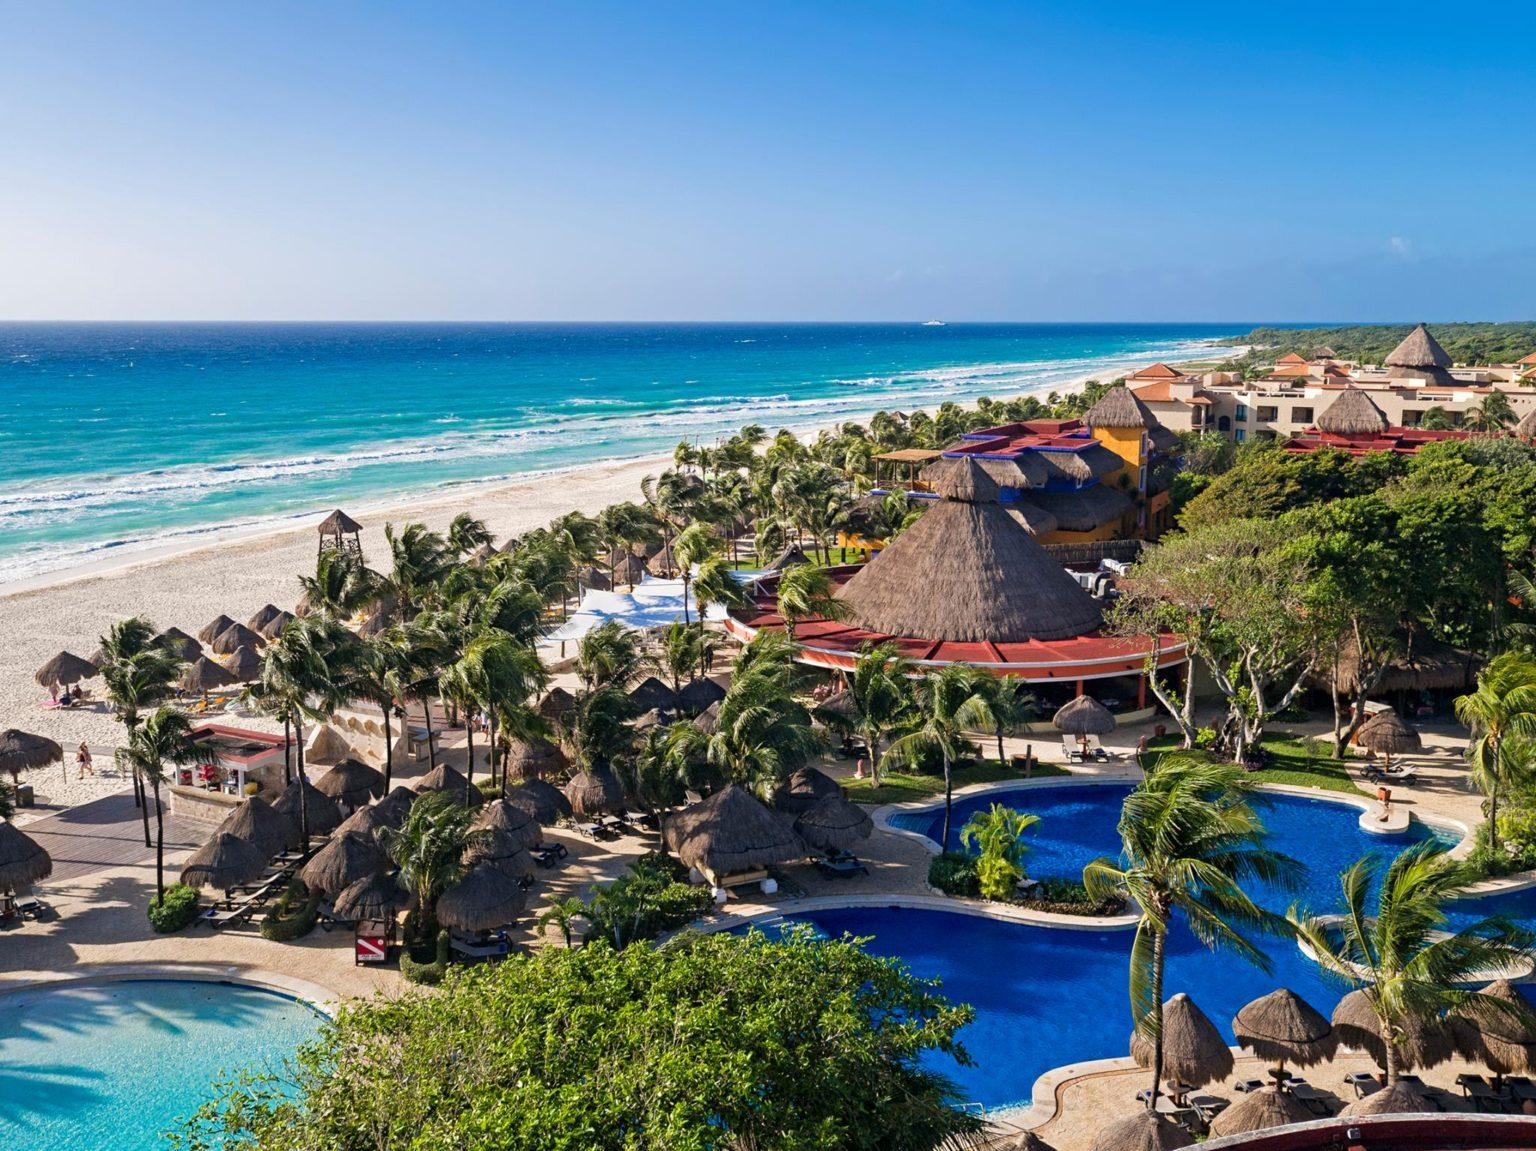 hotel-iberostar-cancun-blogue-voyage-plaisir-et-bien-etre-quebec